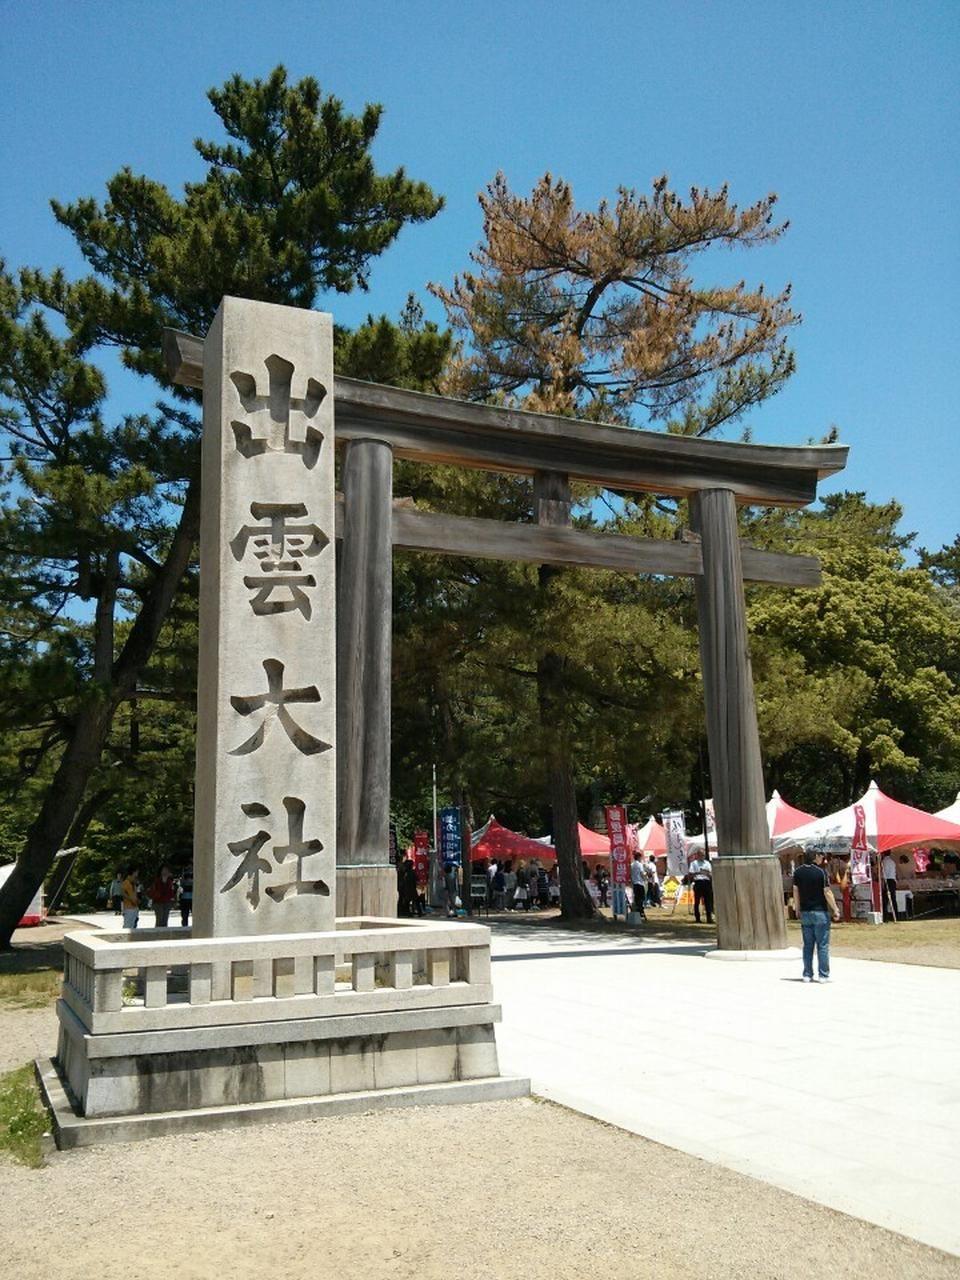 出雲大社 (Izumo-Oyashiro Shrine) - 出雲市, 島根 | Domestic trip ︎【2019 ...